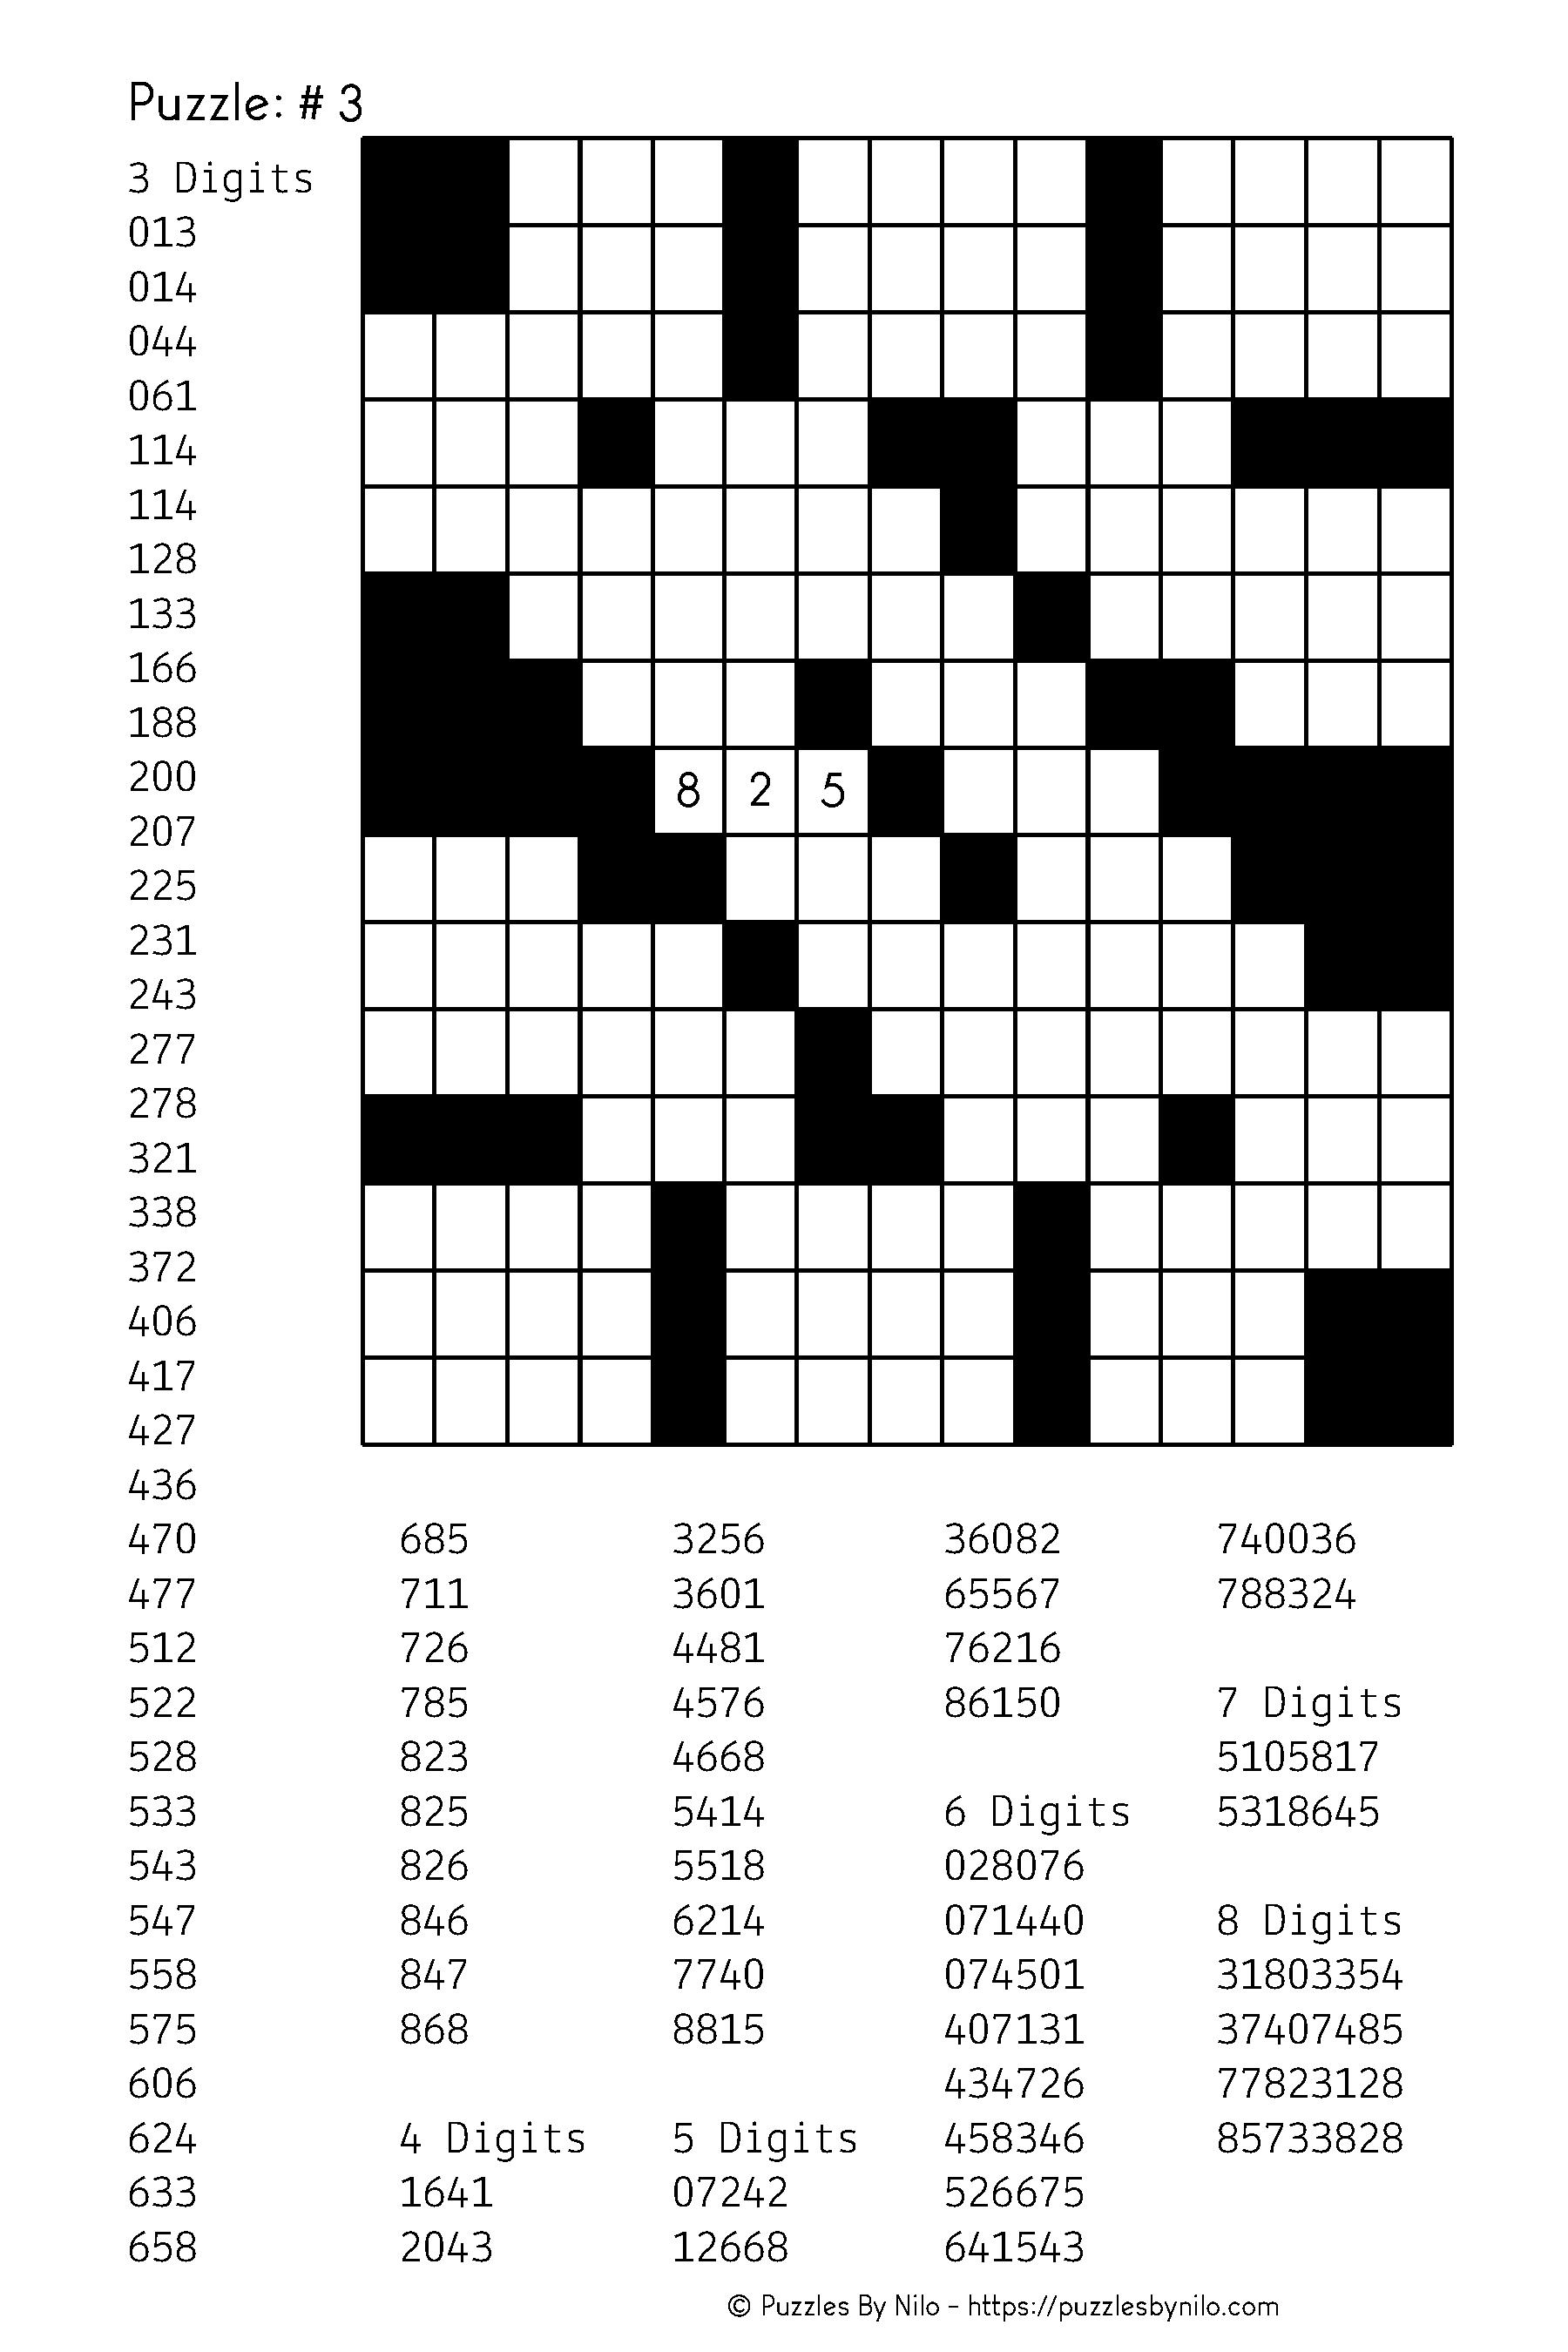 Get Your Free Puzzle Here! - Https://goo.gl/hxpjtw | Math Ideas - Printable Puzzles Ks2